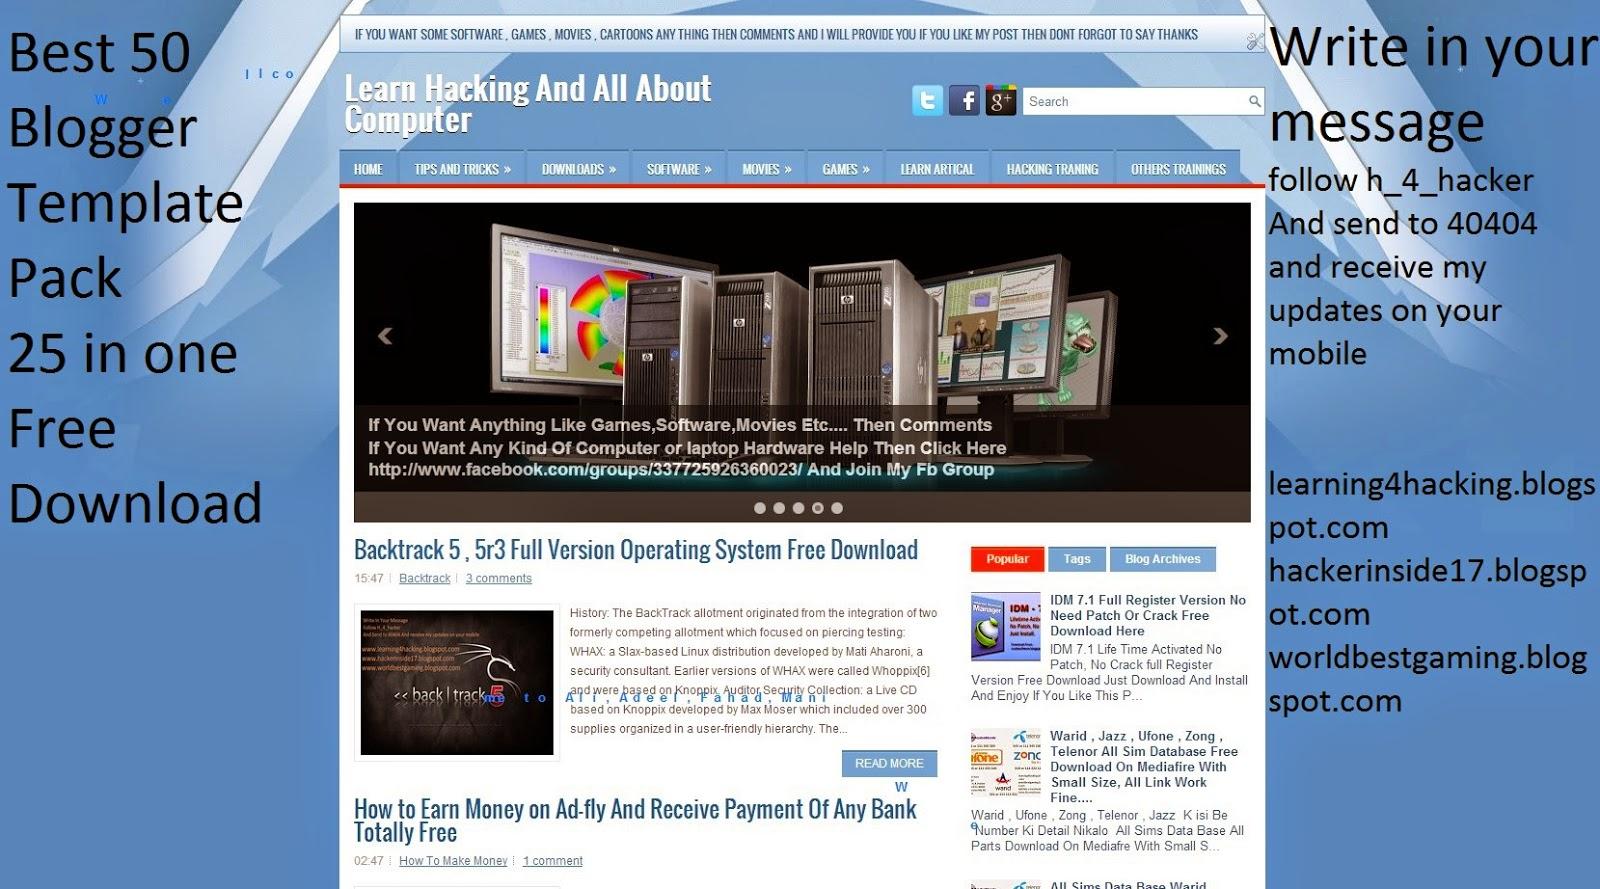 editable blogger templates free - top 25 blogger templates free download download register